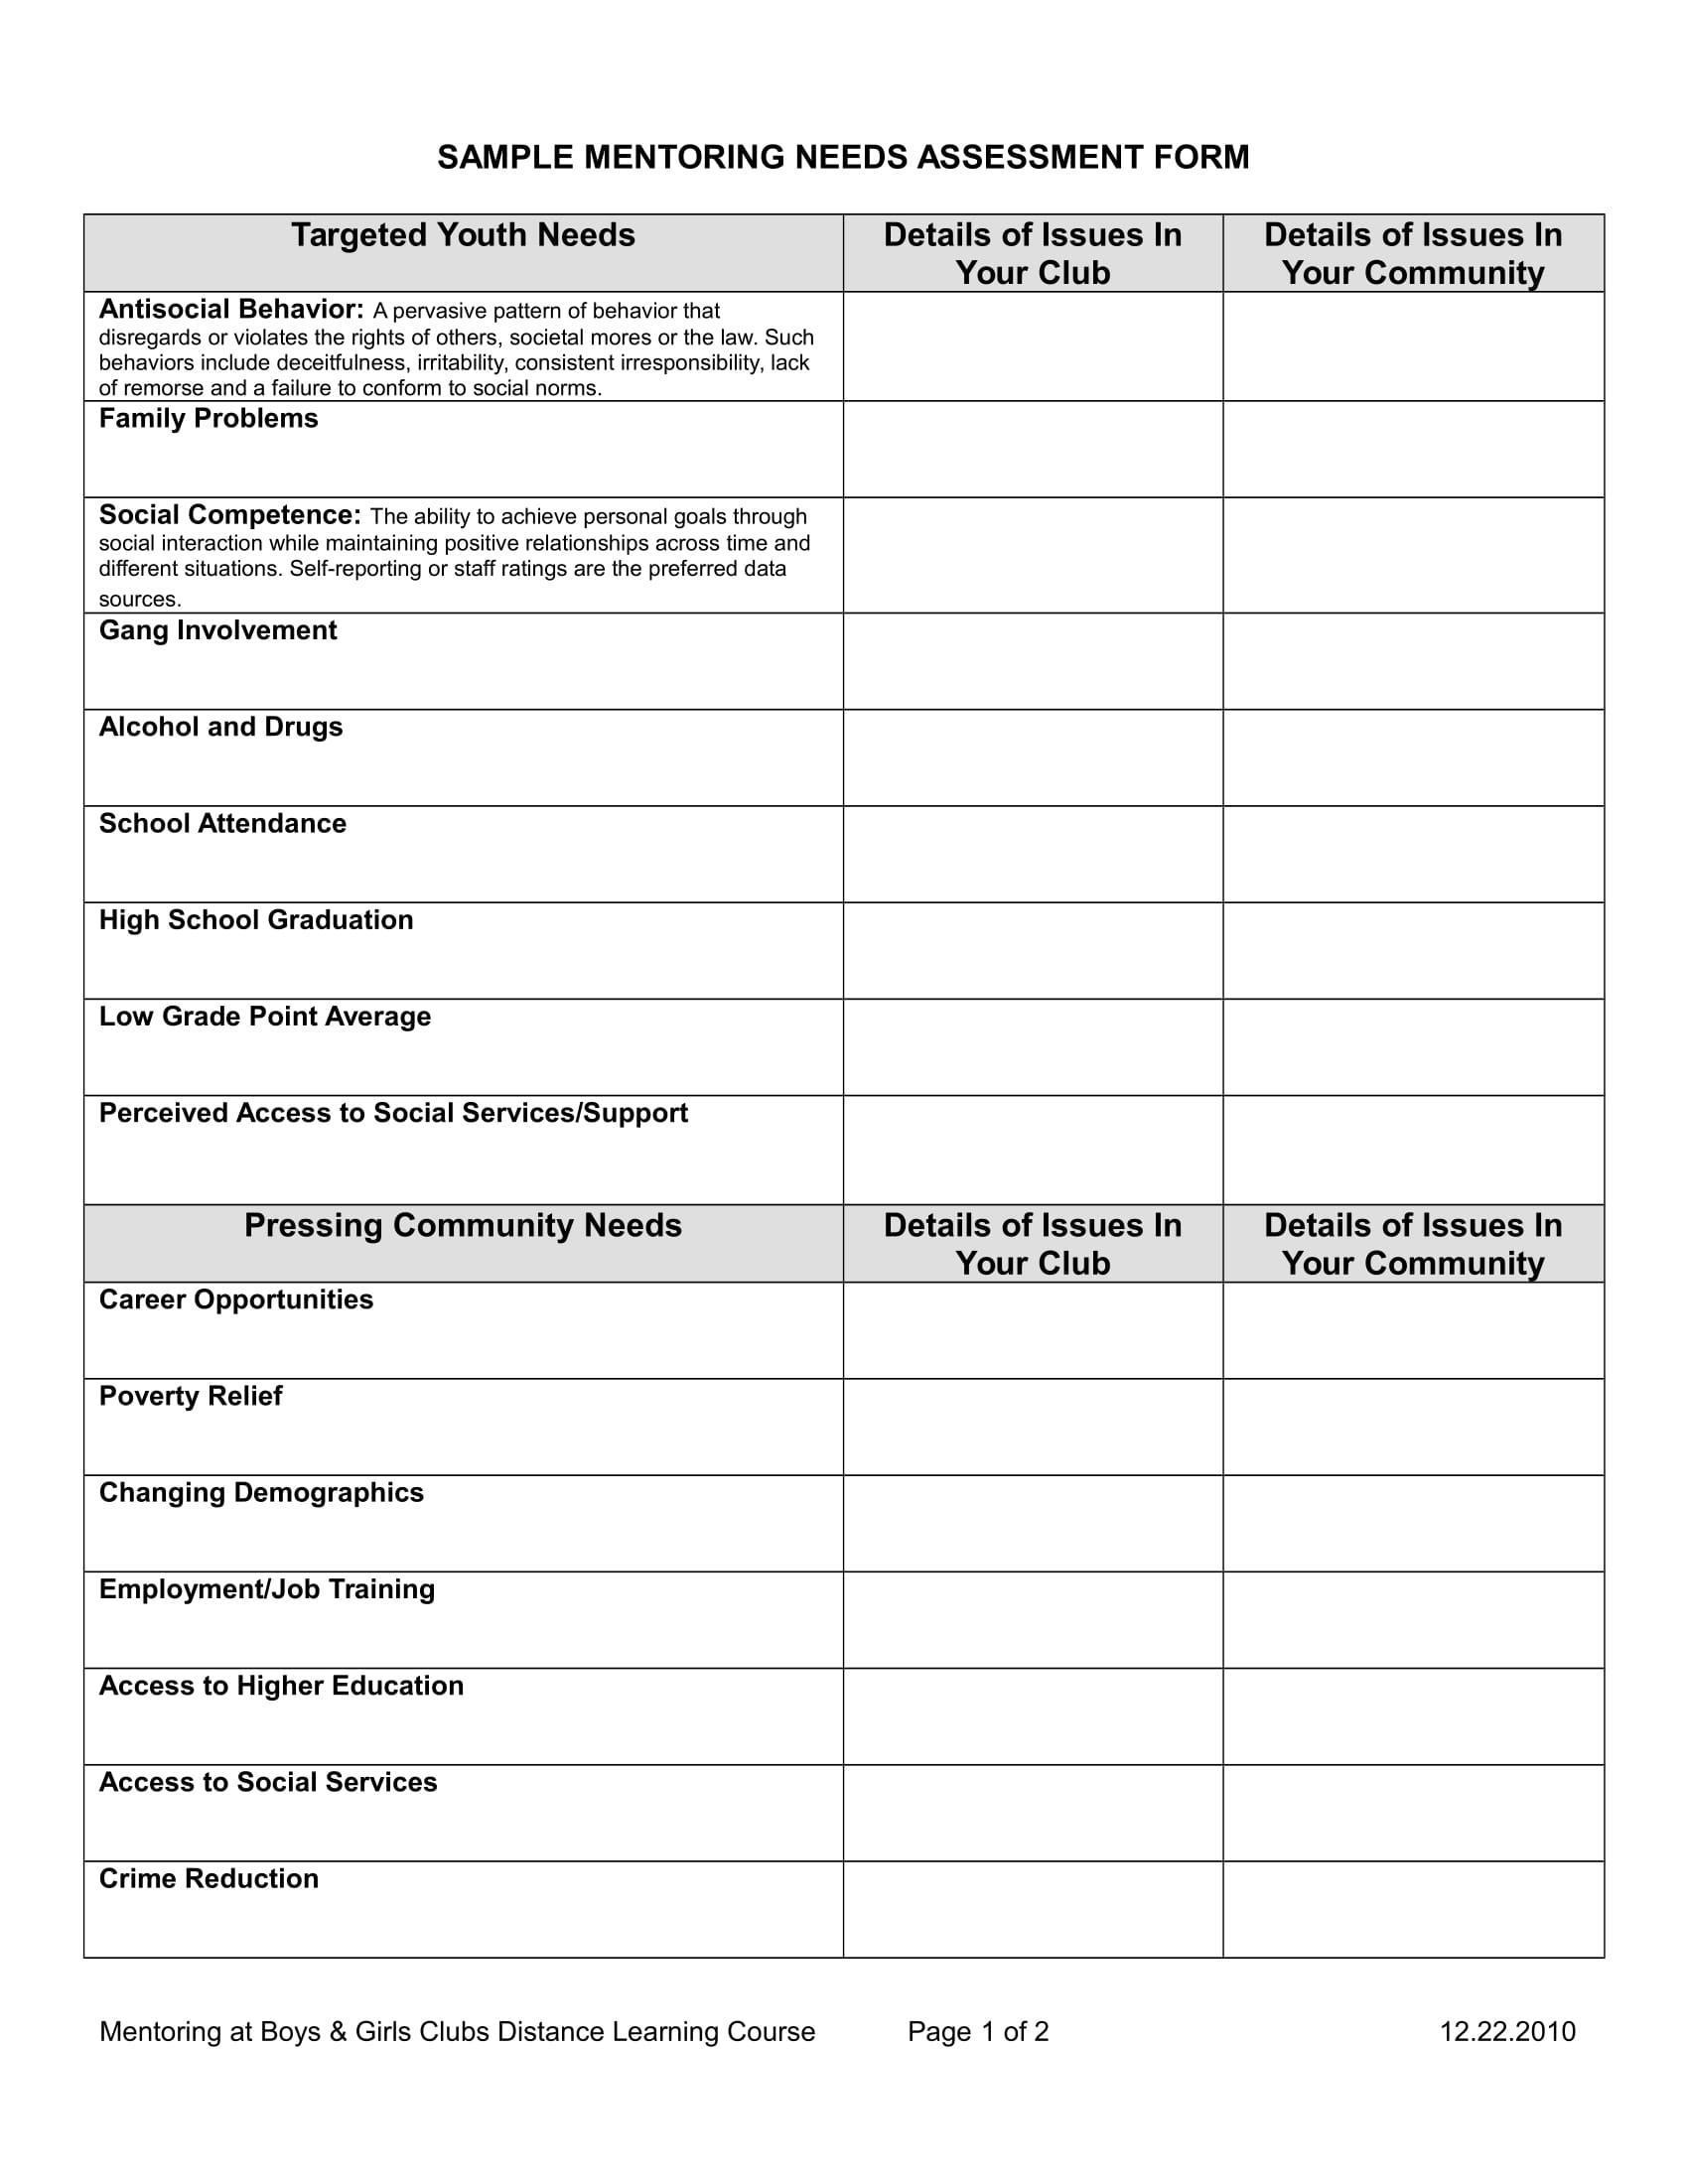 sample mentoring needs assessment form 1